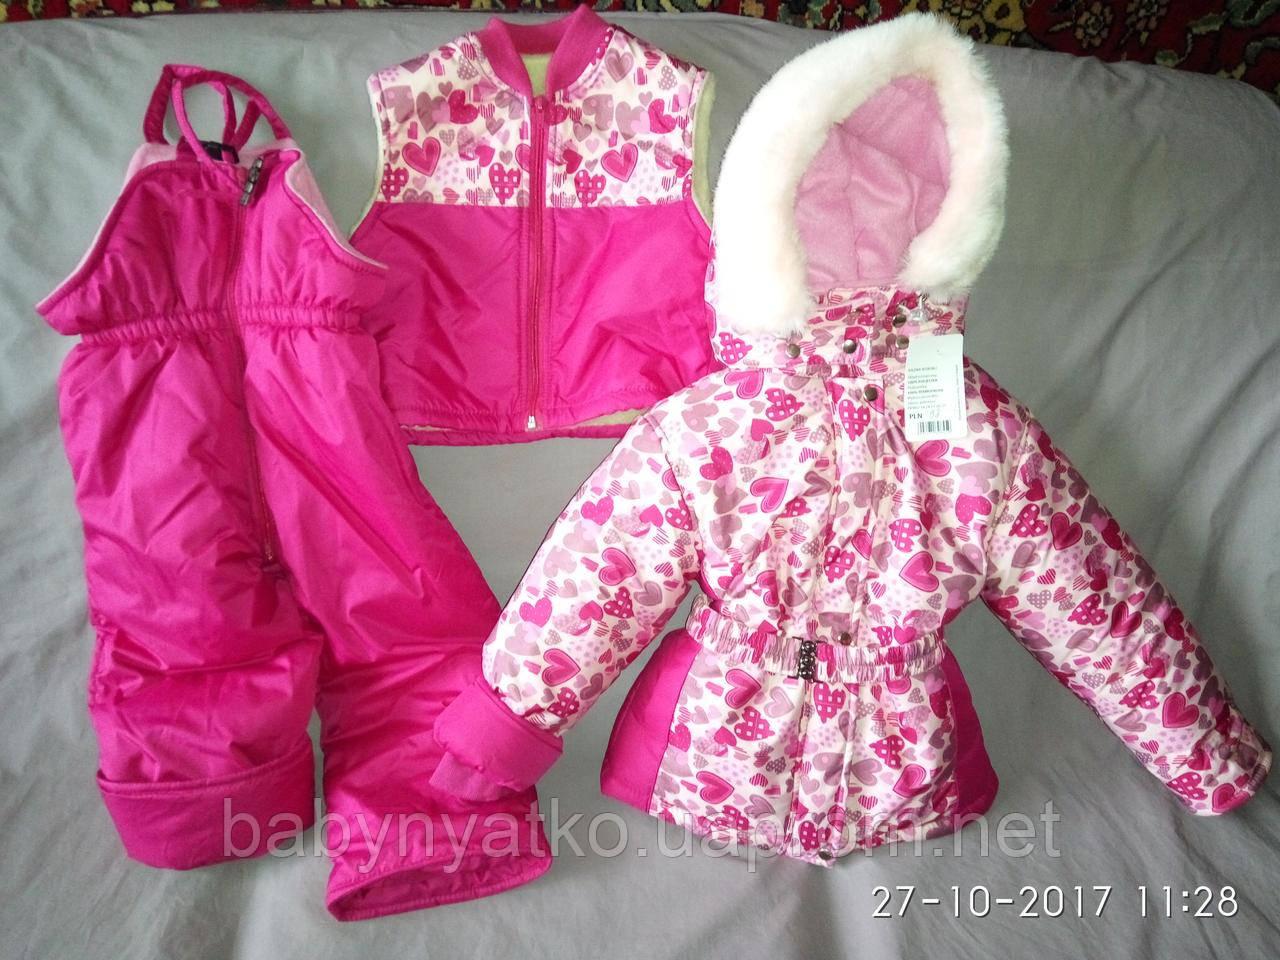 e9d72b6bd753 Зимний термокомбинезон для девочки р.80-116 малиновый сердечки самый  теплый, до -30 мороза, ...